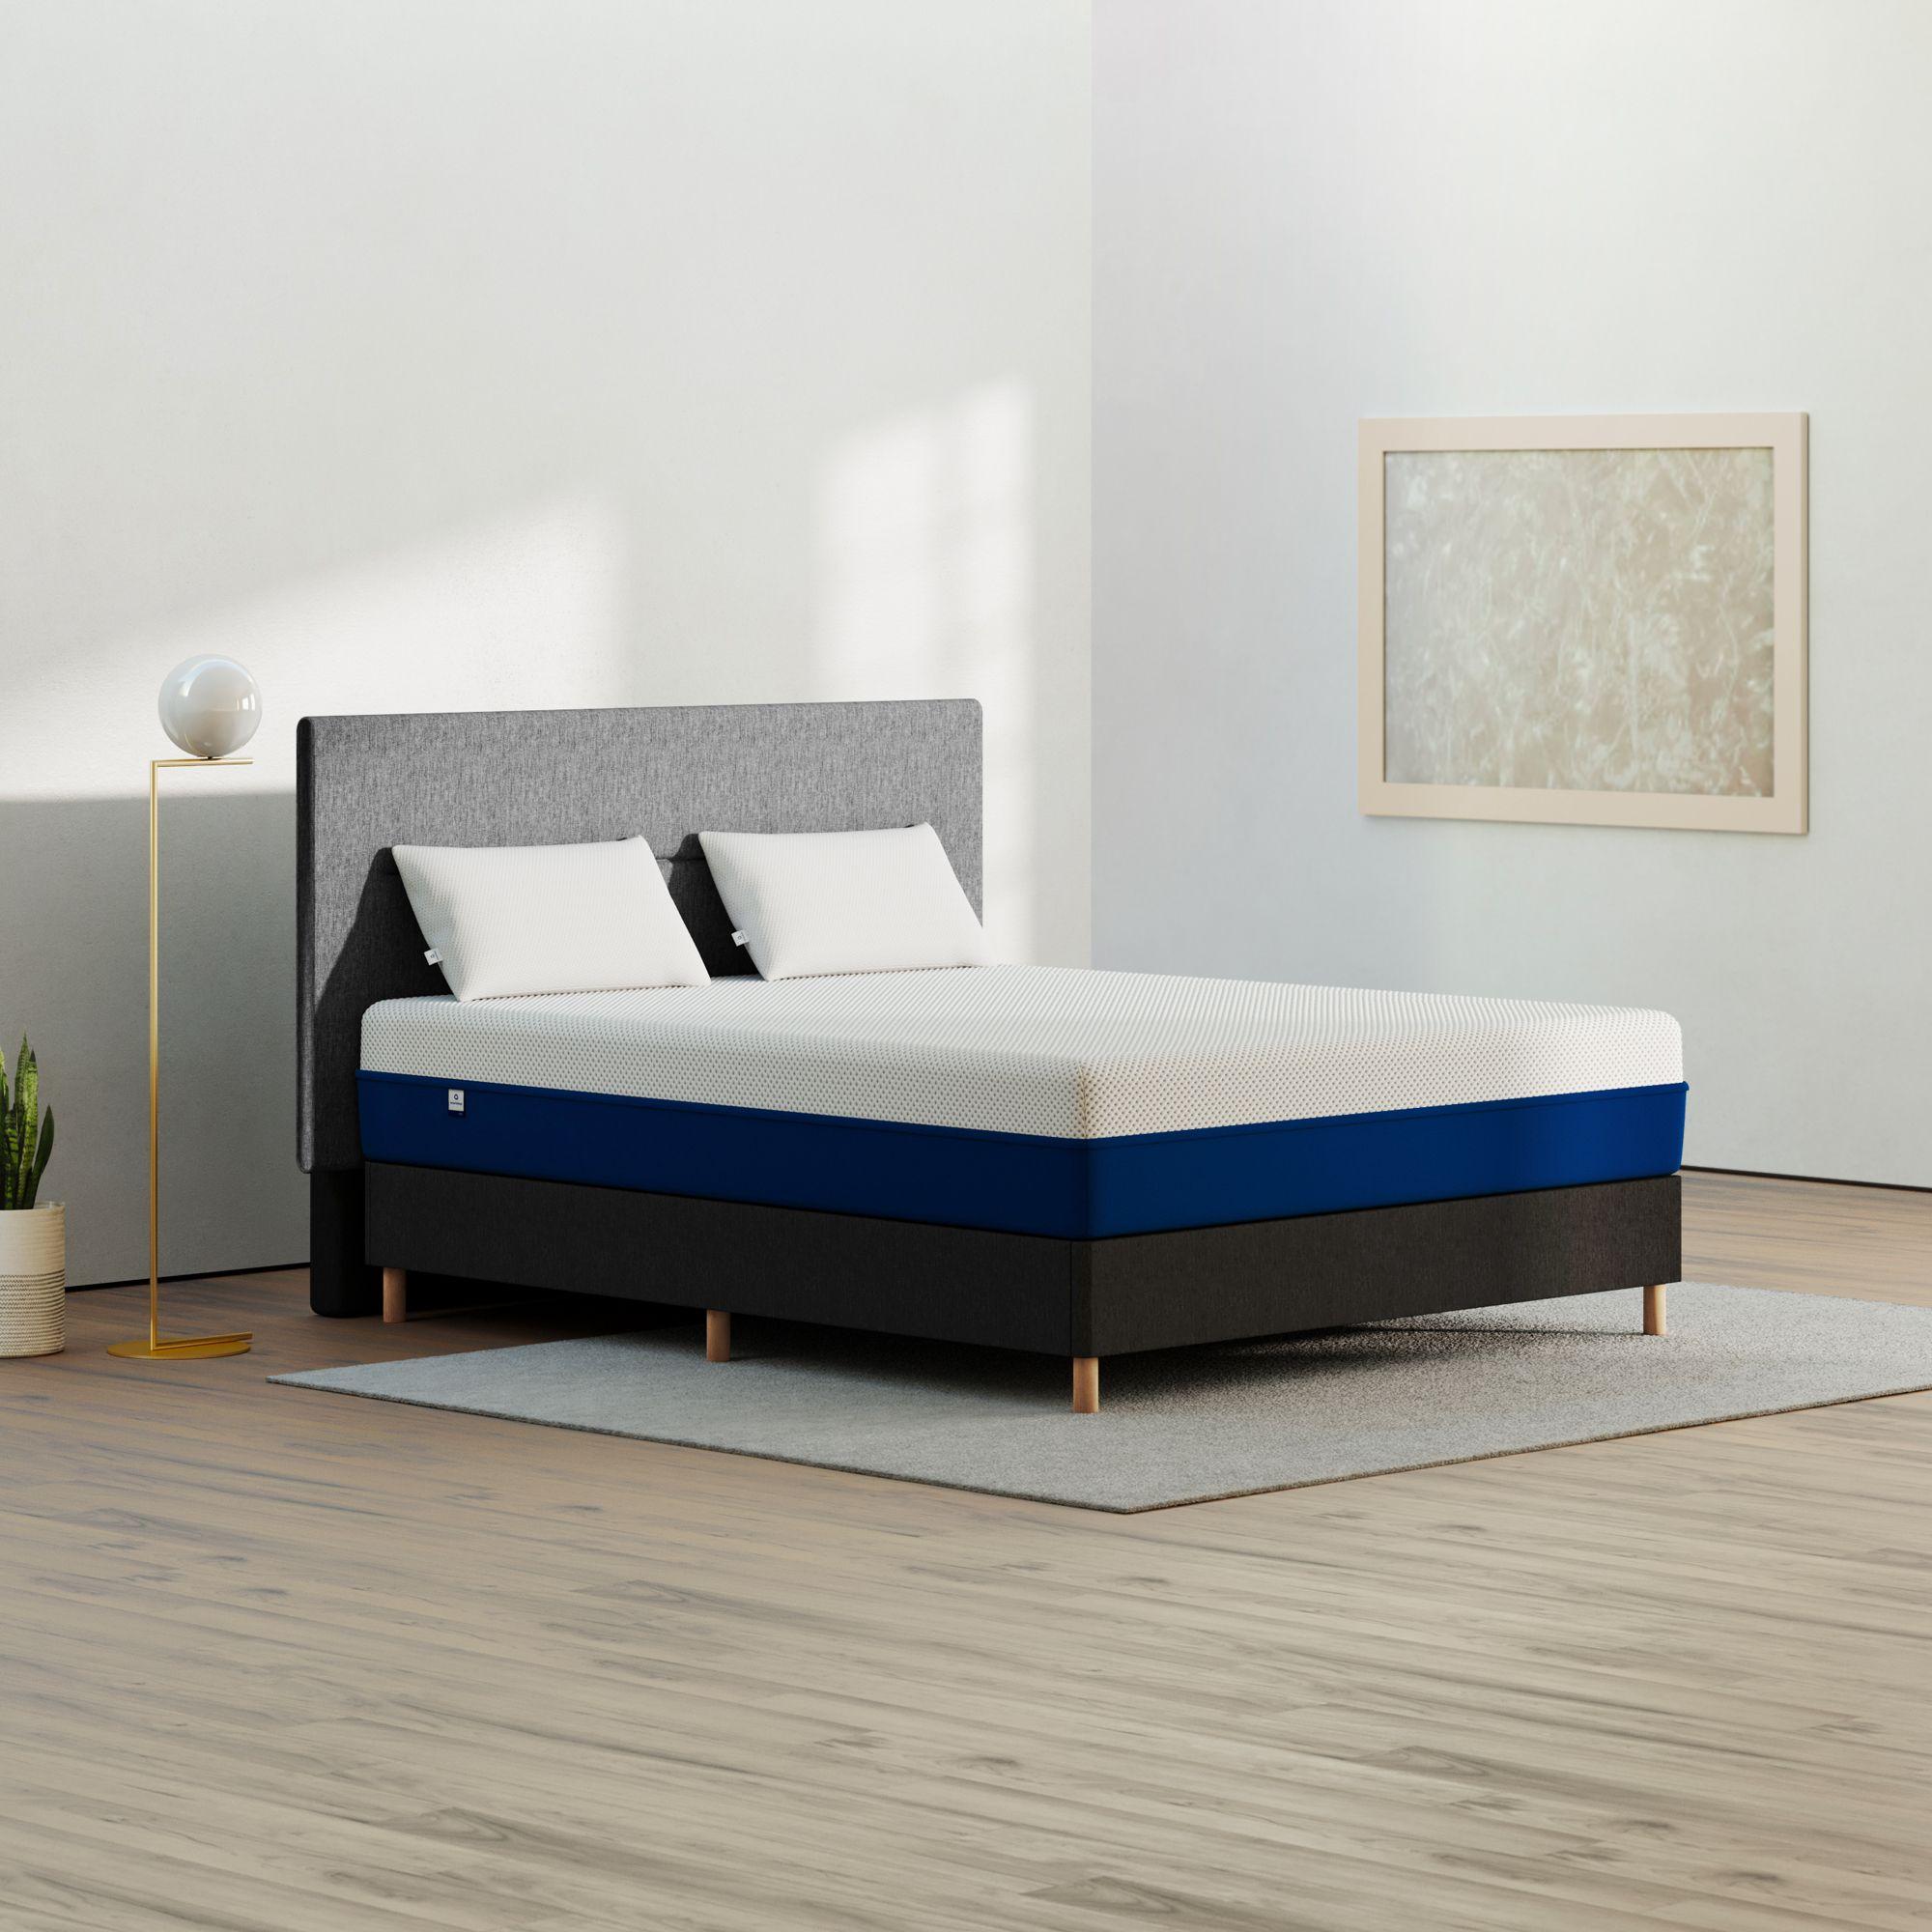 Amerisleep As2 Back Foam Mattress Bed Firm Memory Foam Mattress